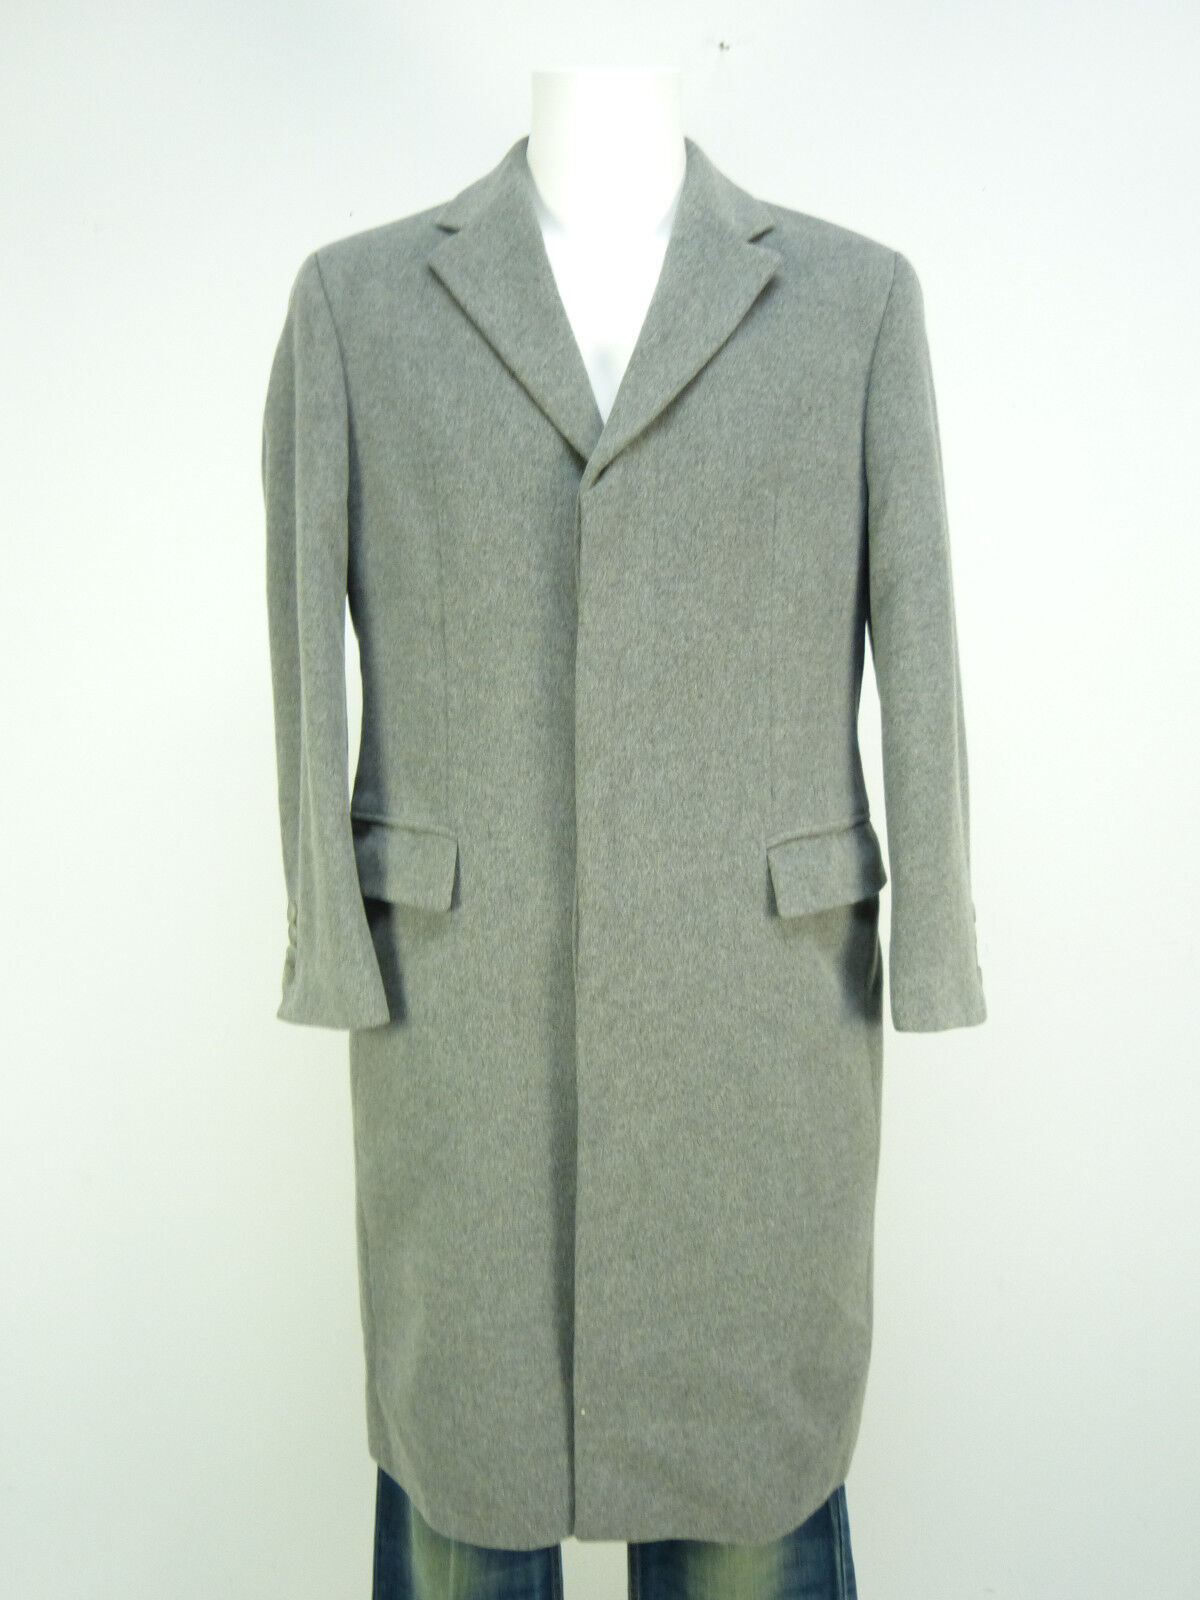 HUGO BOSS  MANTEL GR 48   grey & WINTERWARM - MIT CASHMERE   ( N 9900 )